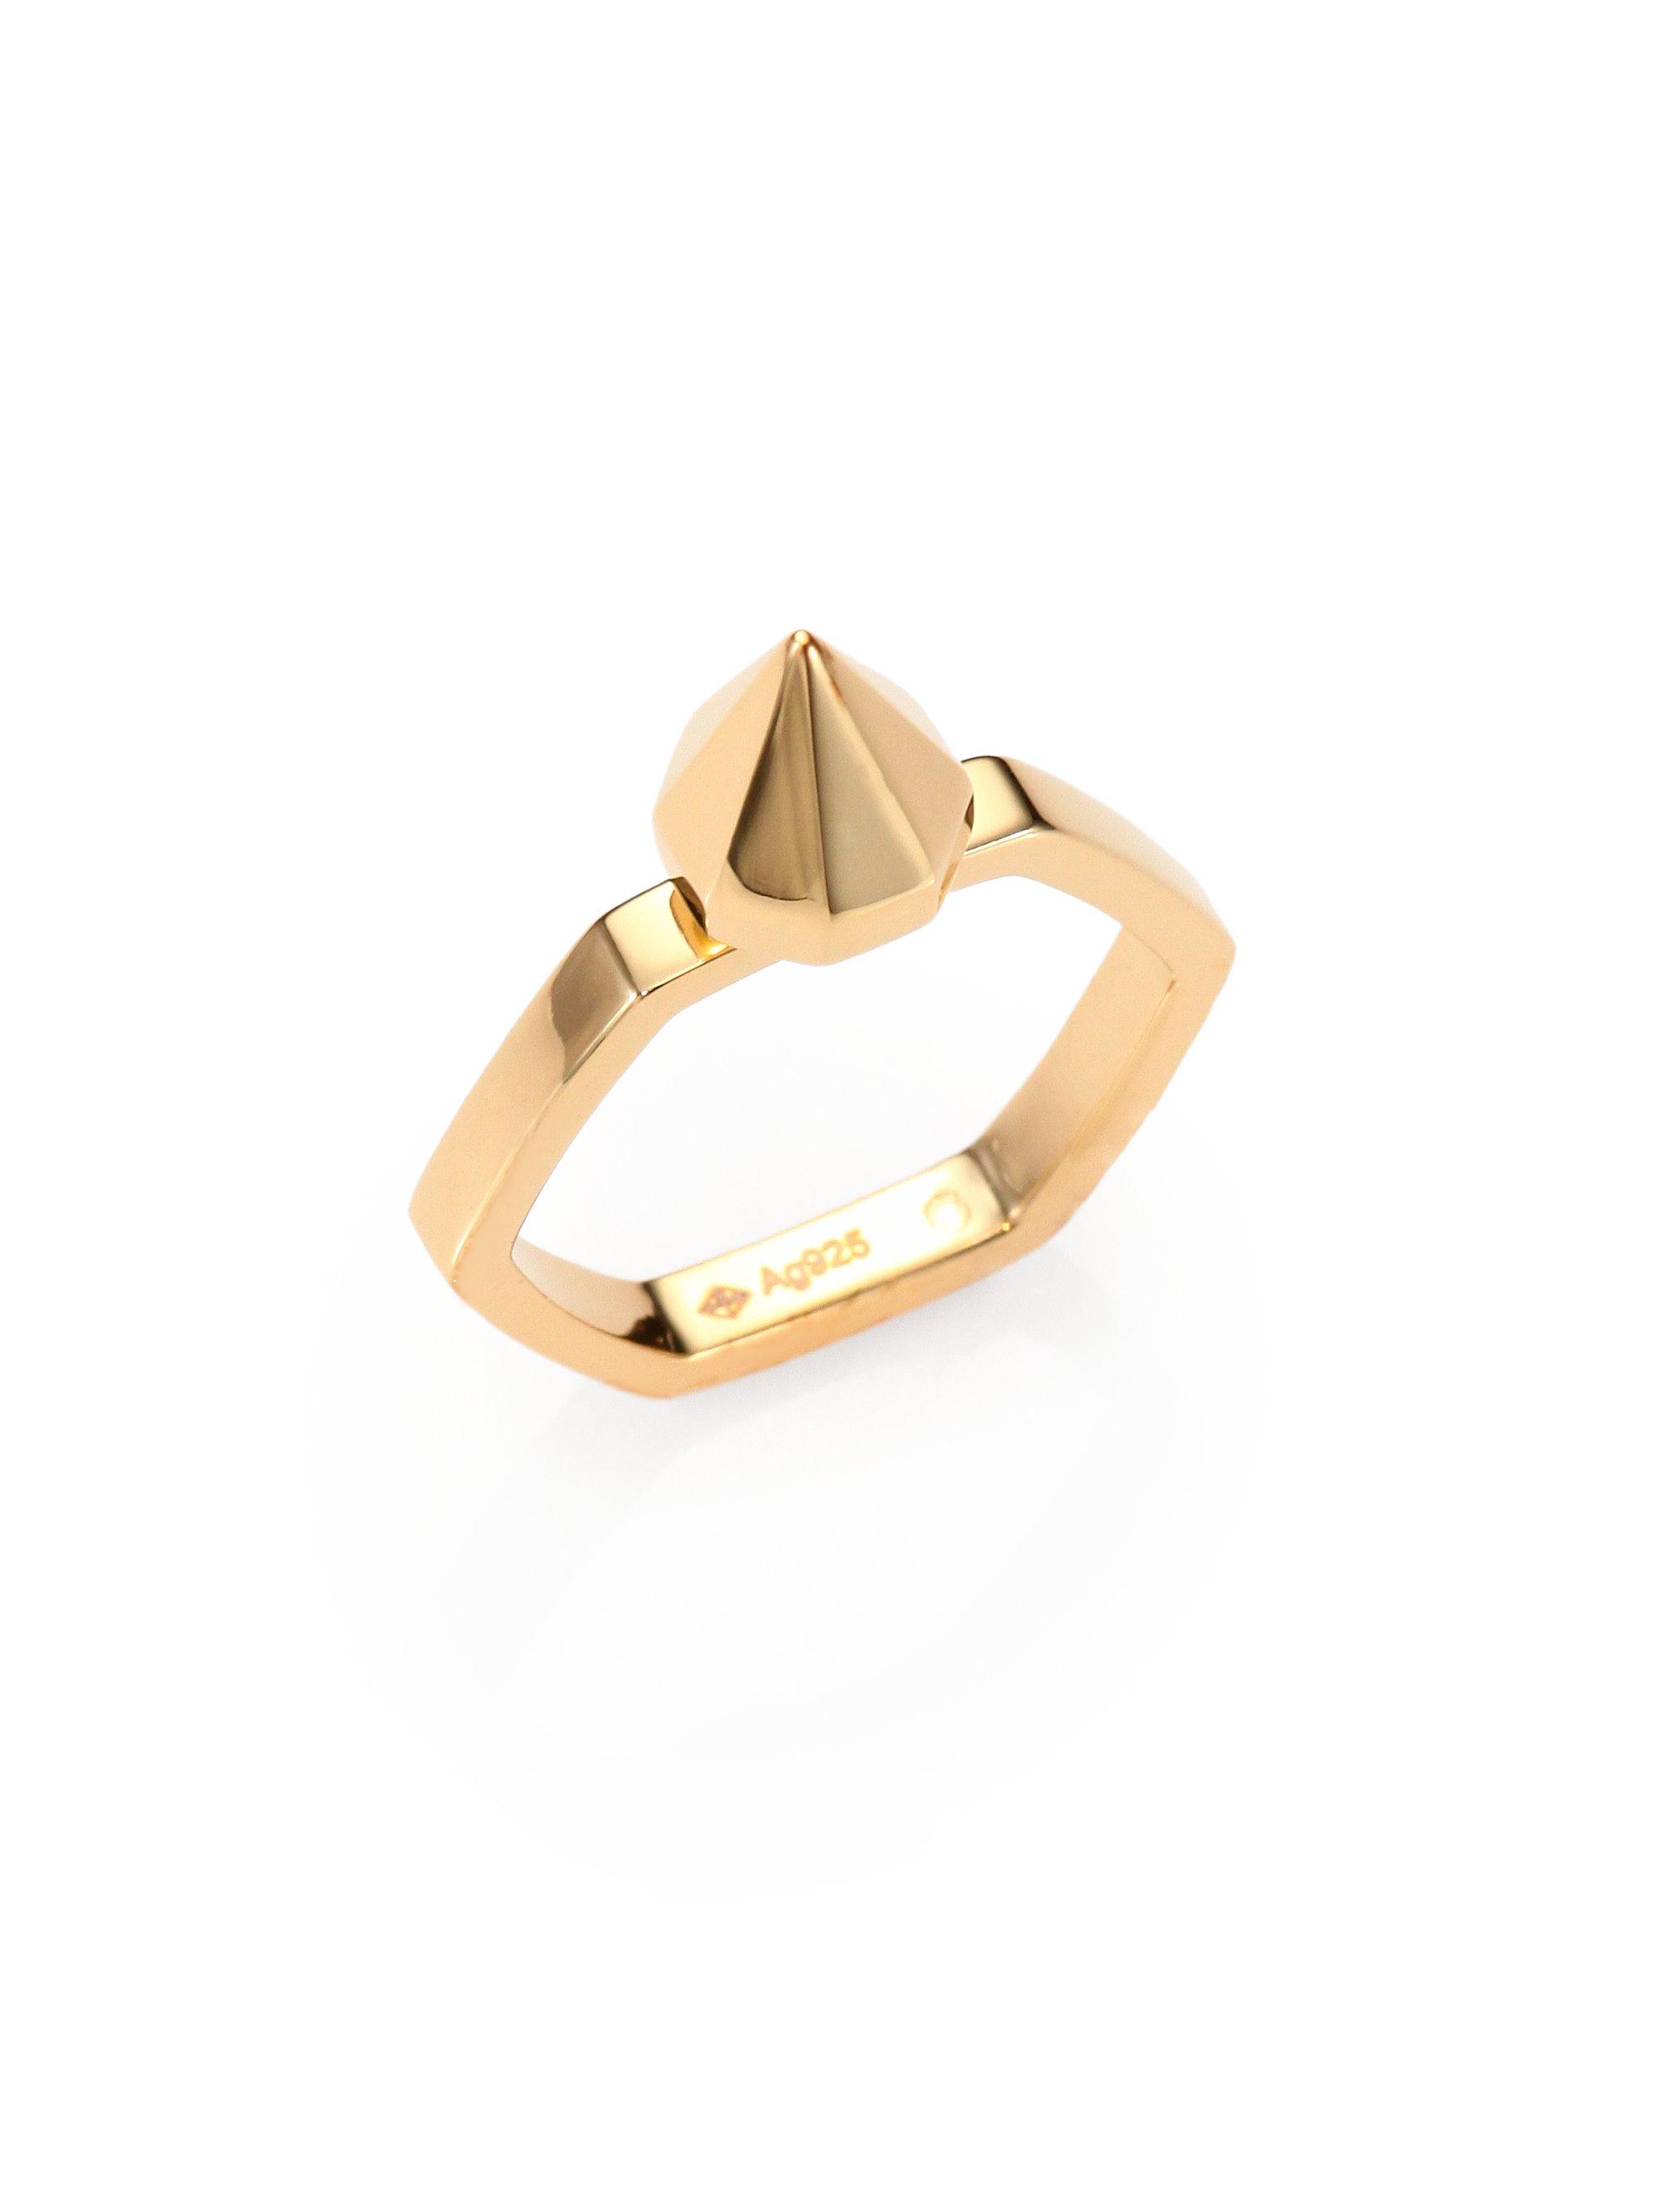 Saint Laurent Bague Exago Clou 18k Gold Vermeil Spike